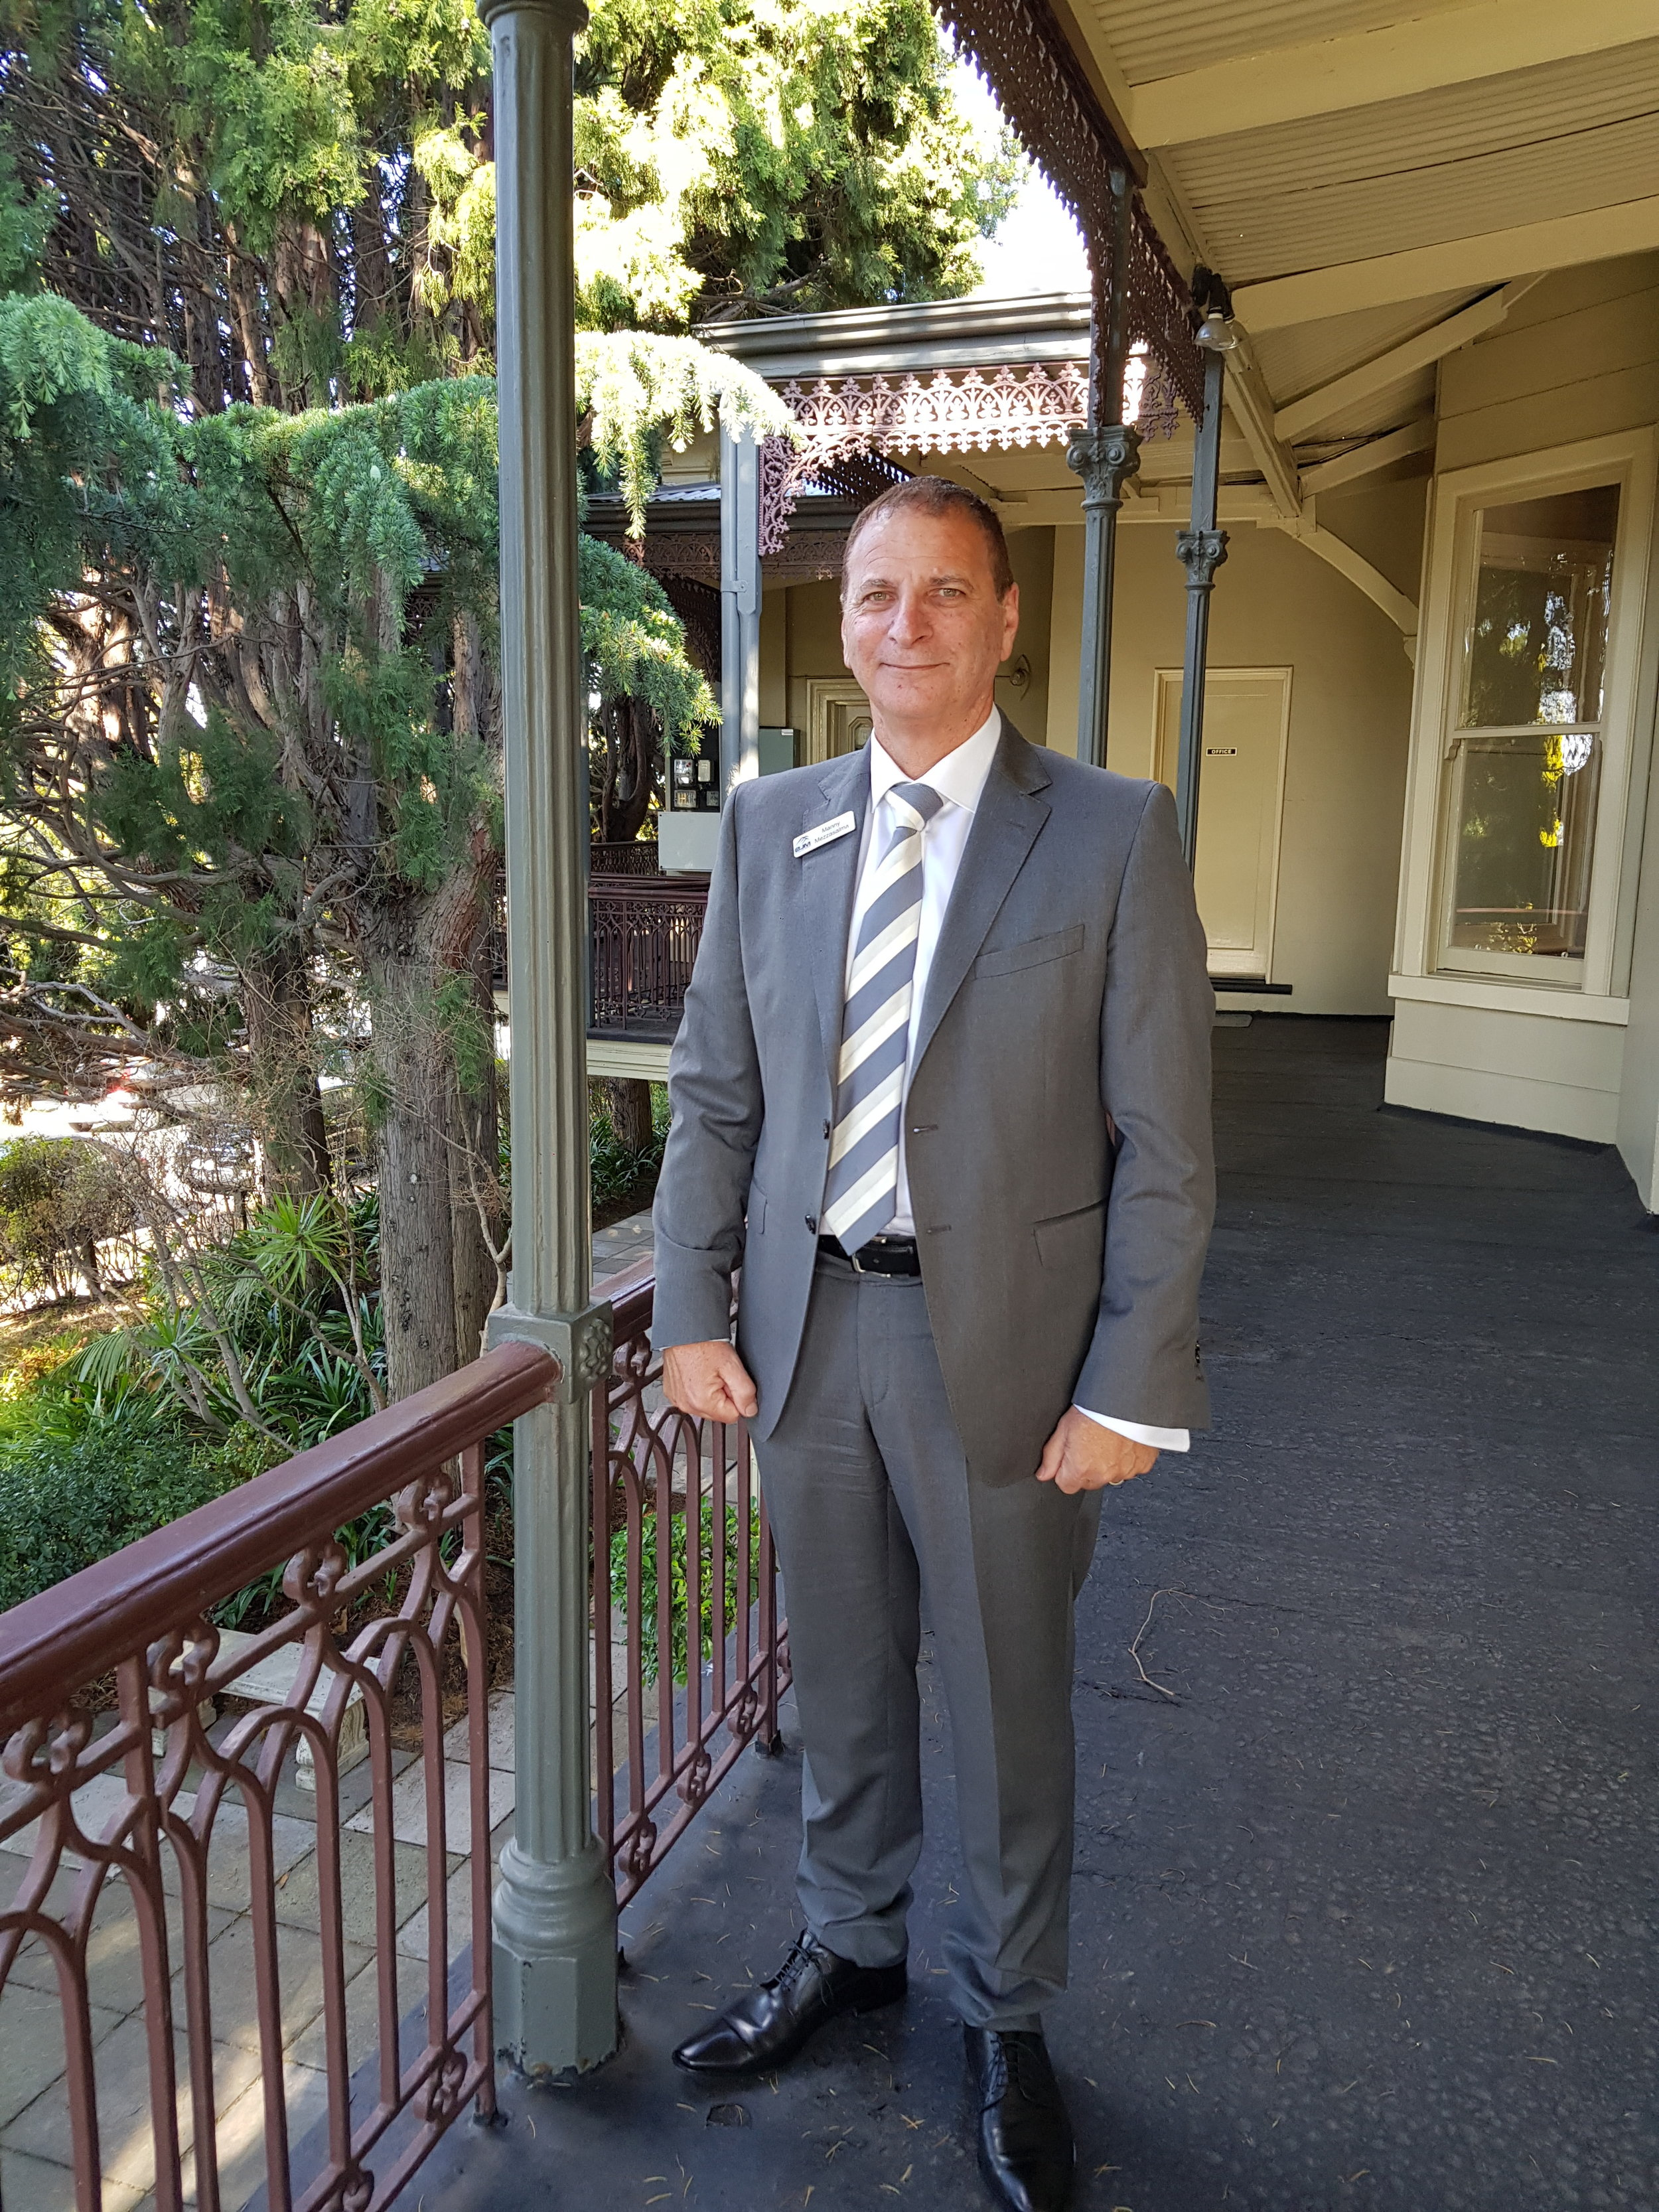 Manny mezzasalma - CEO, Adviser  Email: m.mezzasalma@ejm.com.au  Mobile: 0433 140 411